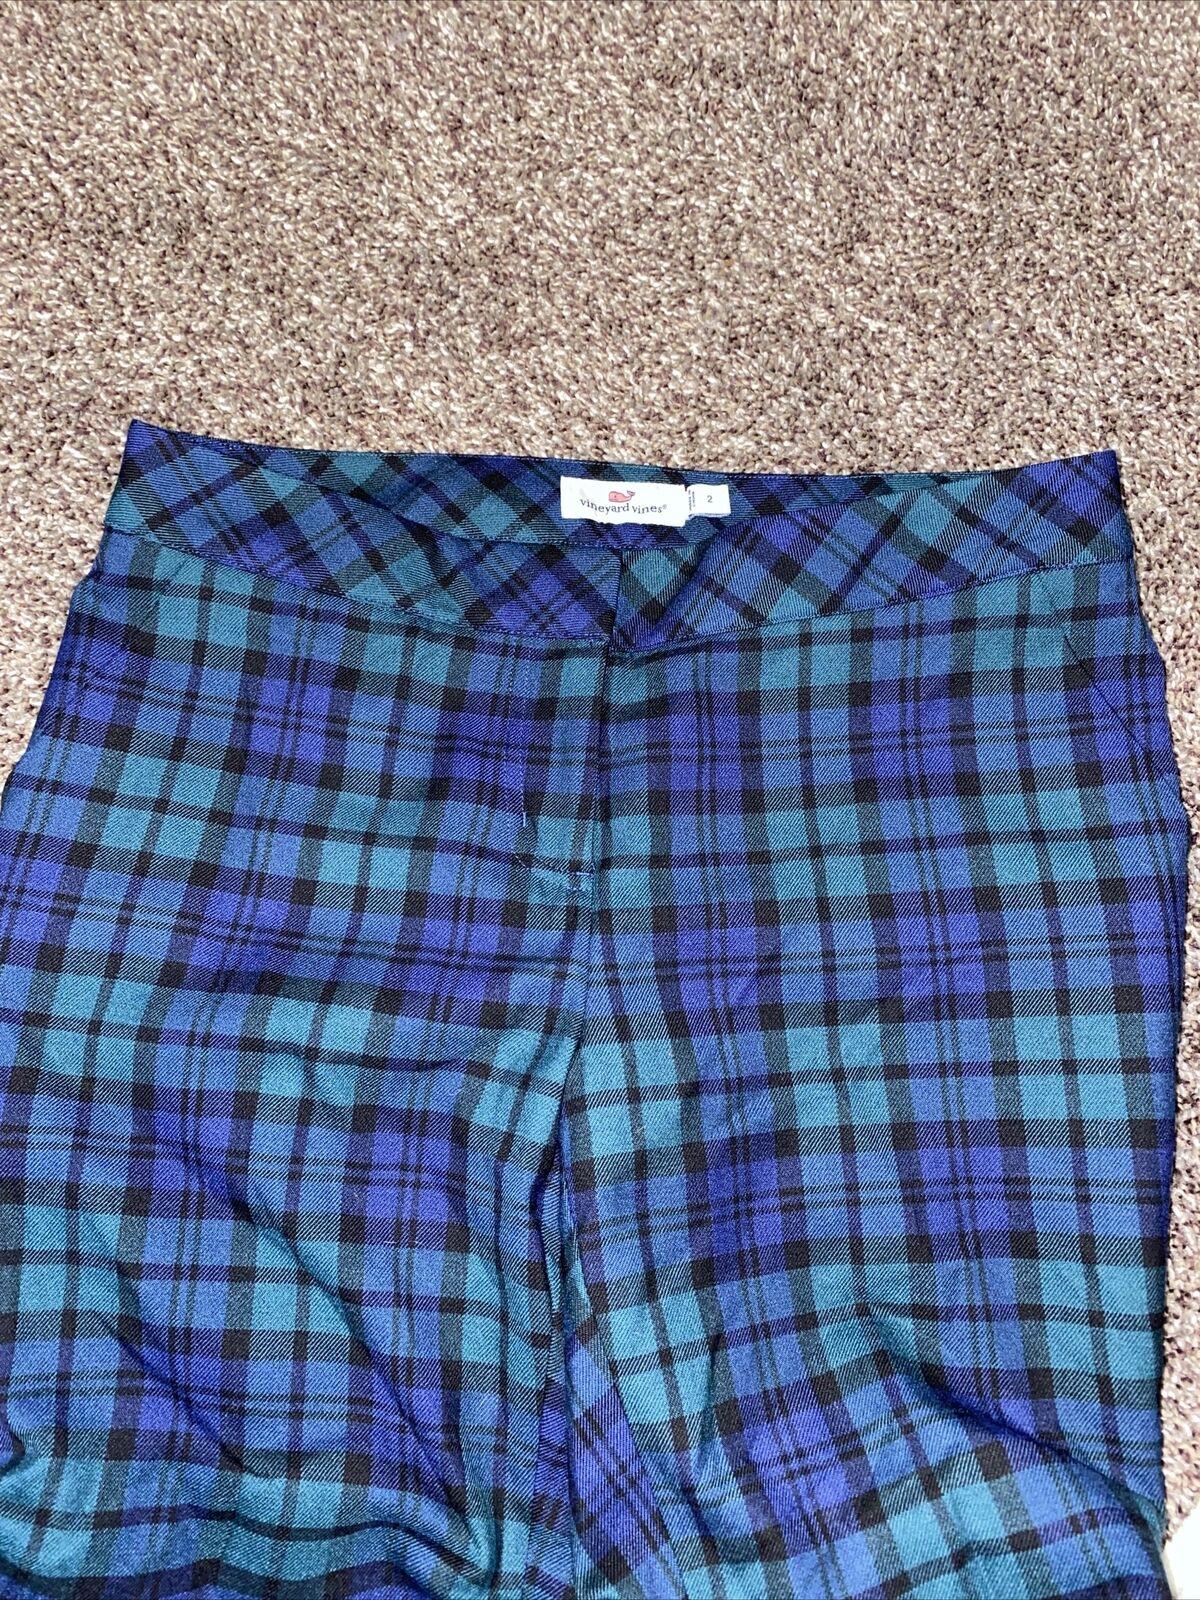 Womens Vineyard Vines Plaid Pants Size 2 Dress Pa… - image 4